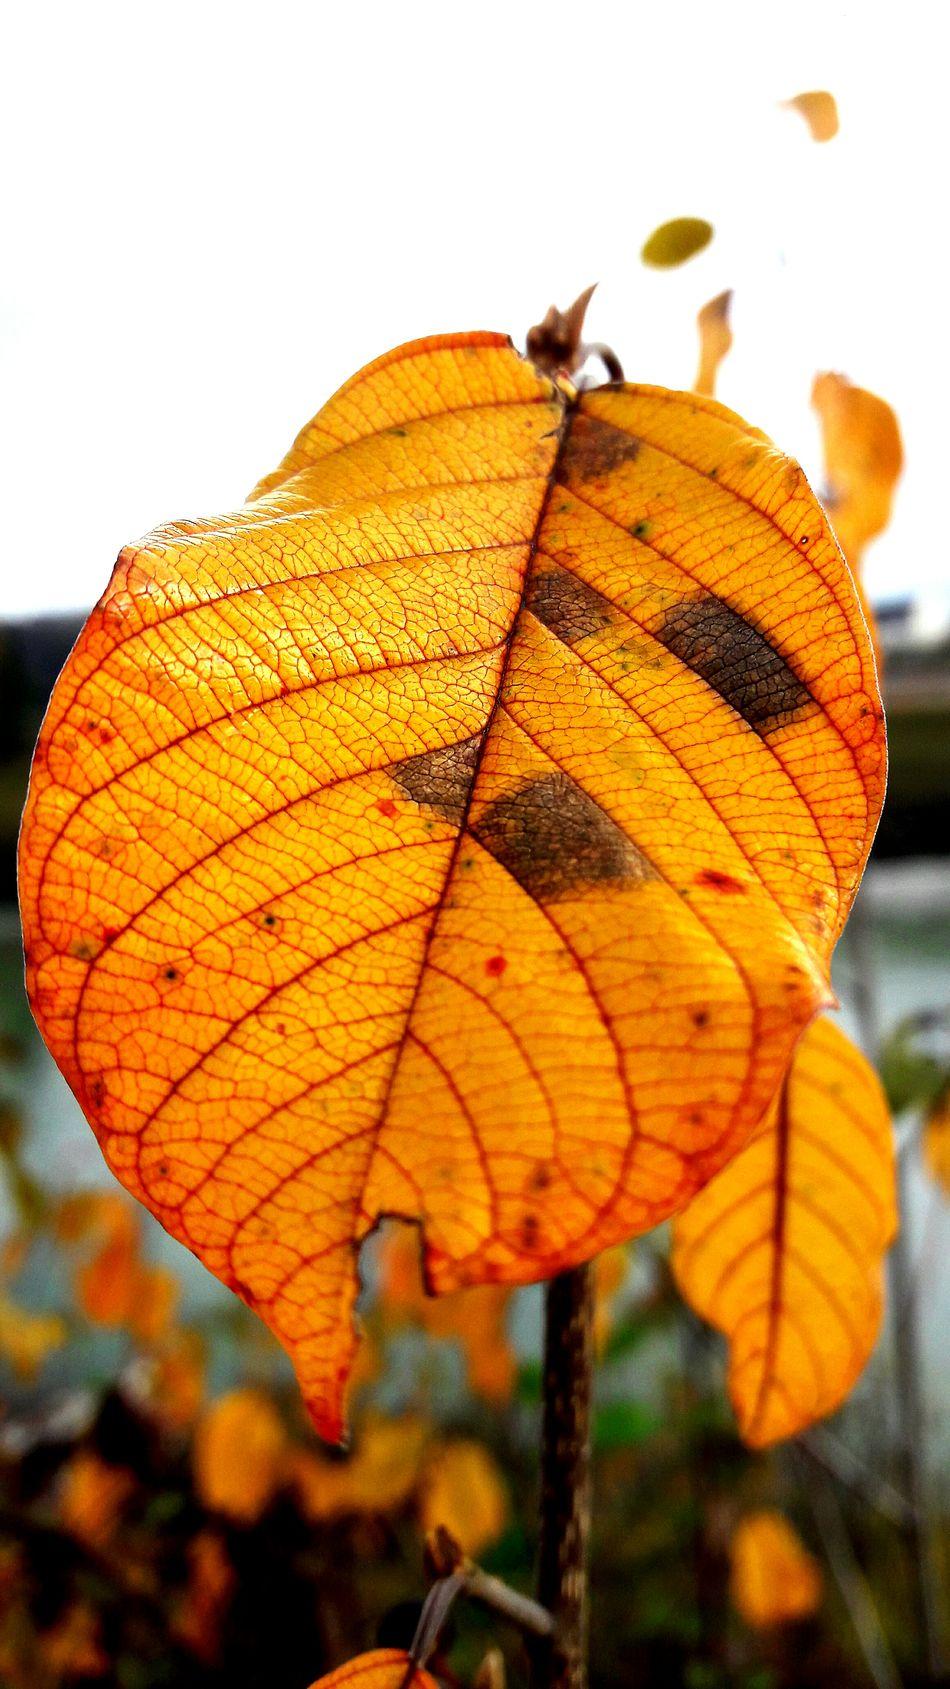 Herbst2016 Natur Beauti In Natur Gelb Orang